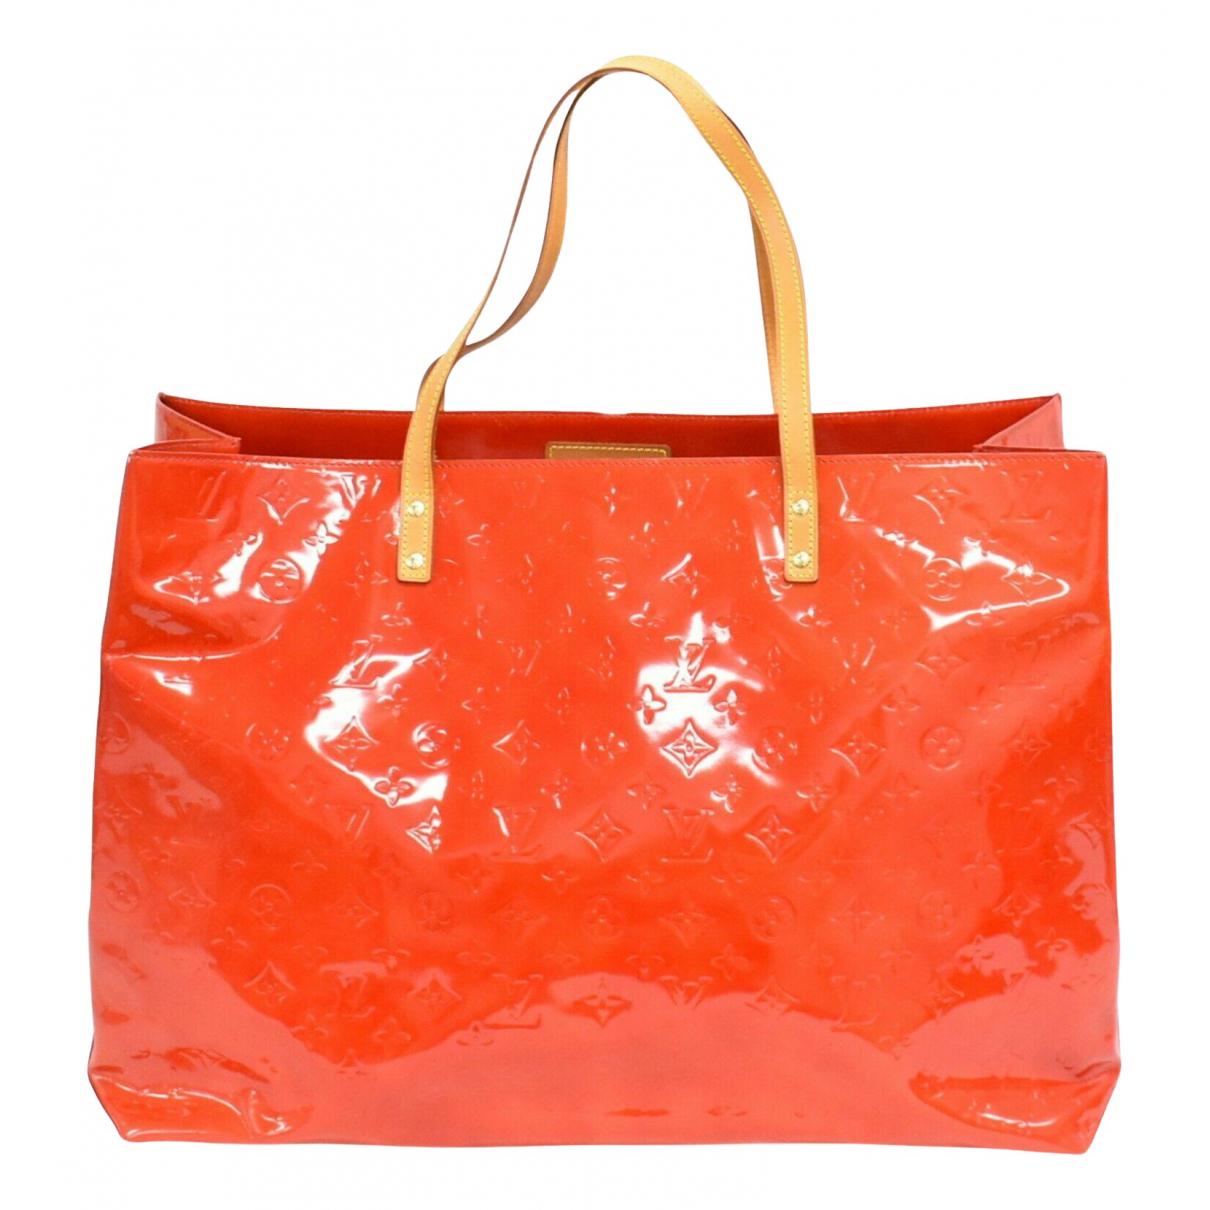 Louis Vuitton Reade Orange Patent leather handbag for Women N